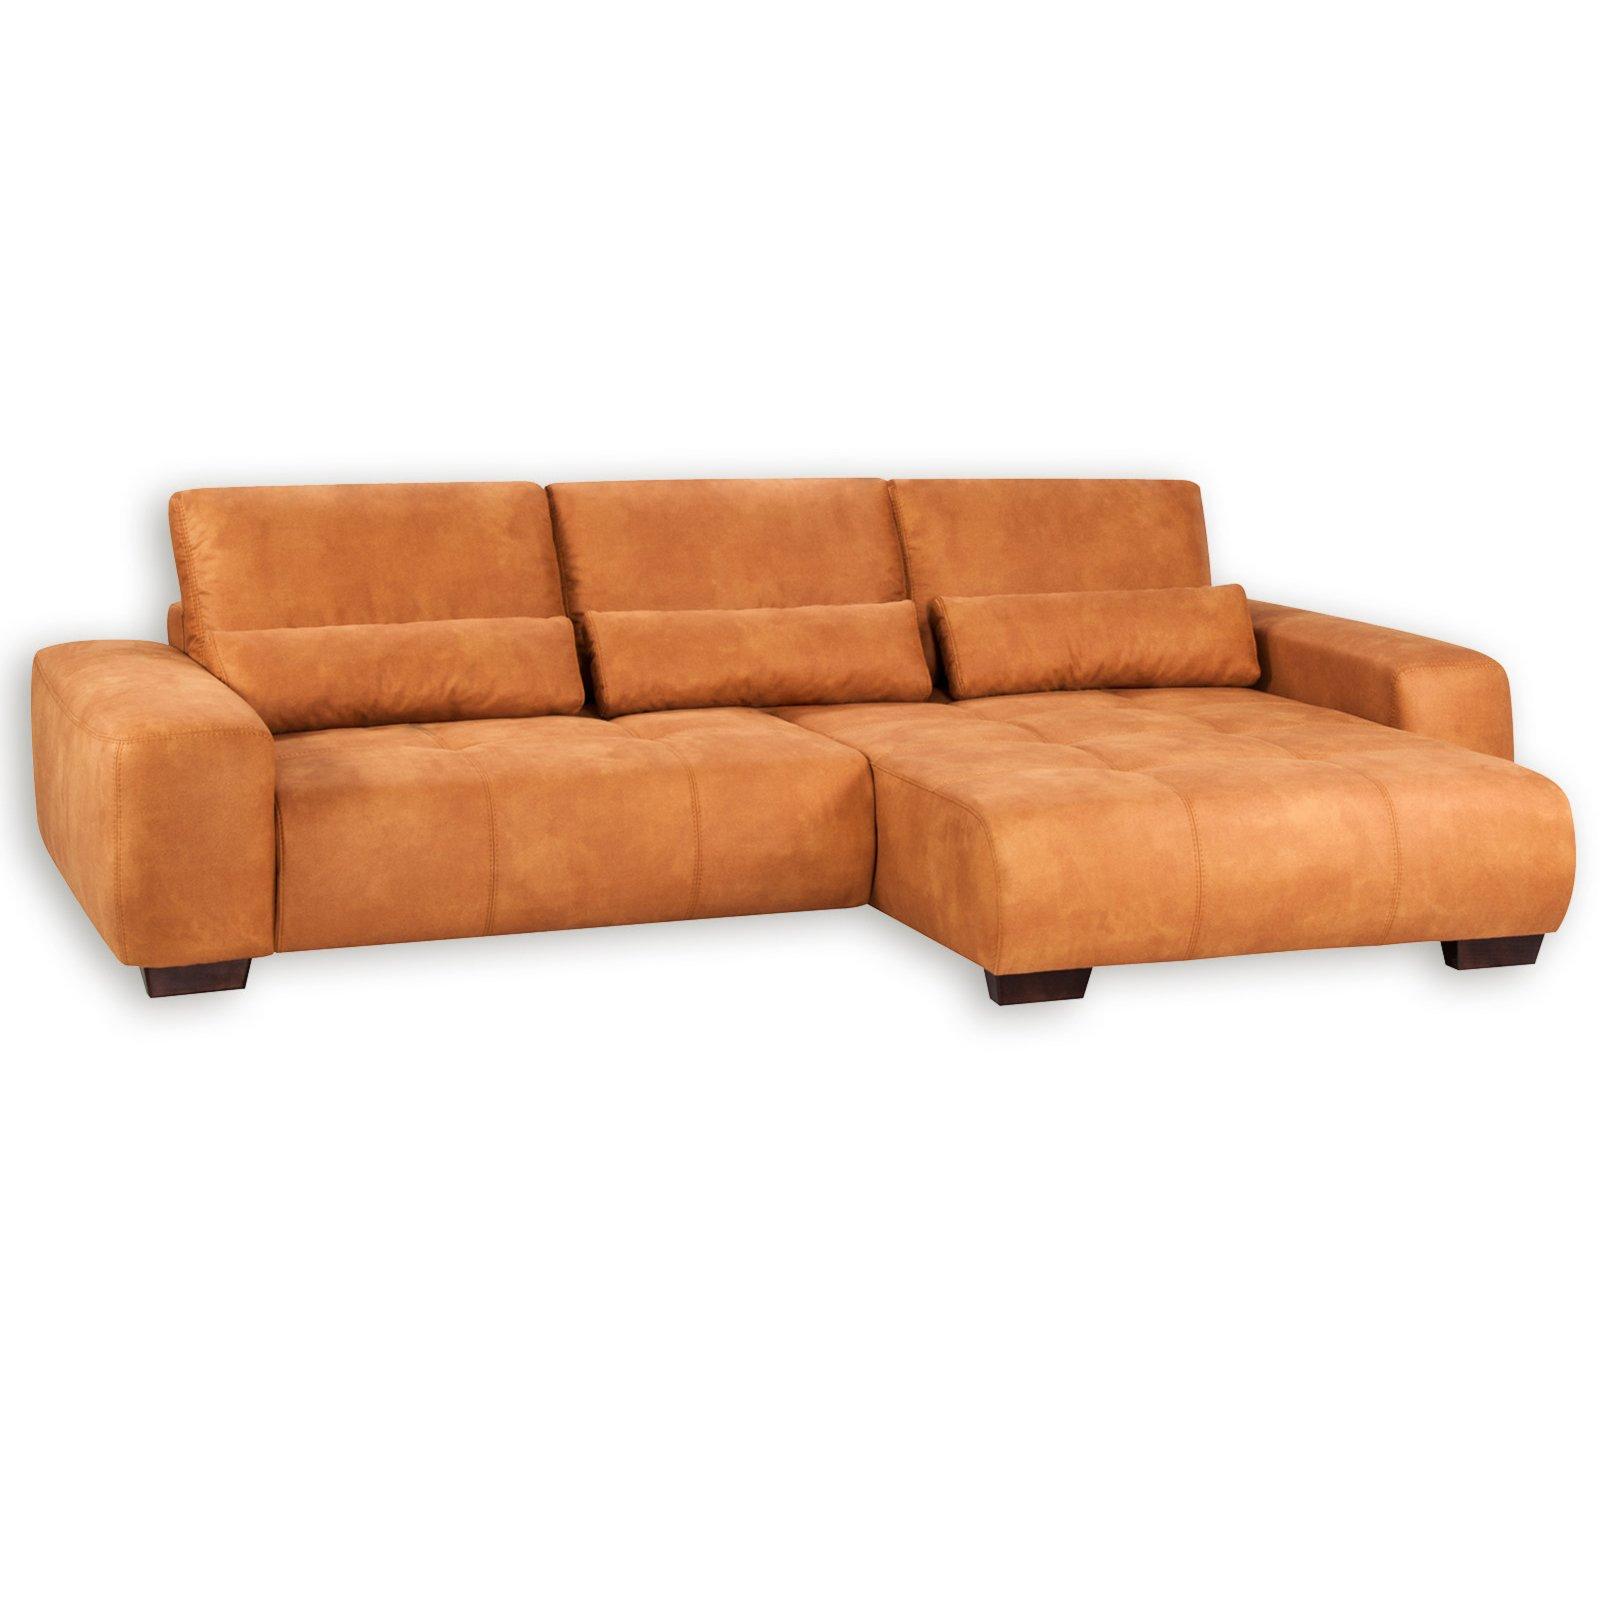 boxspringsofa curry dauerschl fer ebay. Black Bedroom Furniture Sets. Home Design Ideas